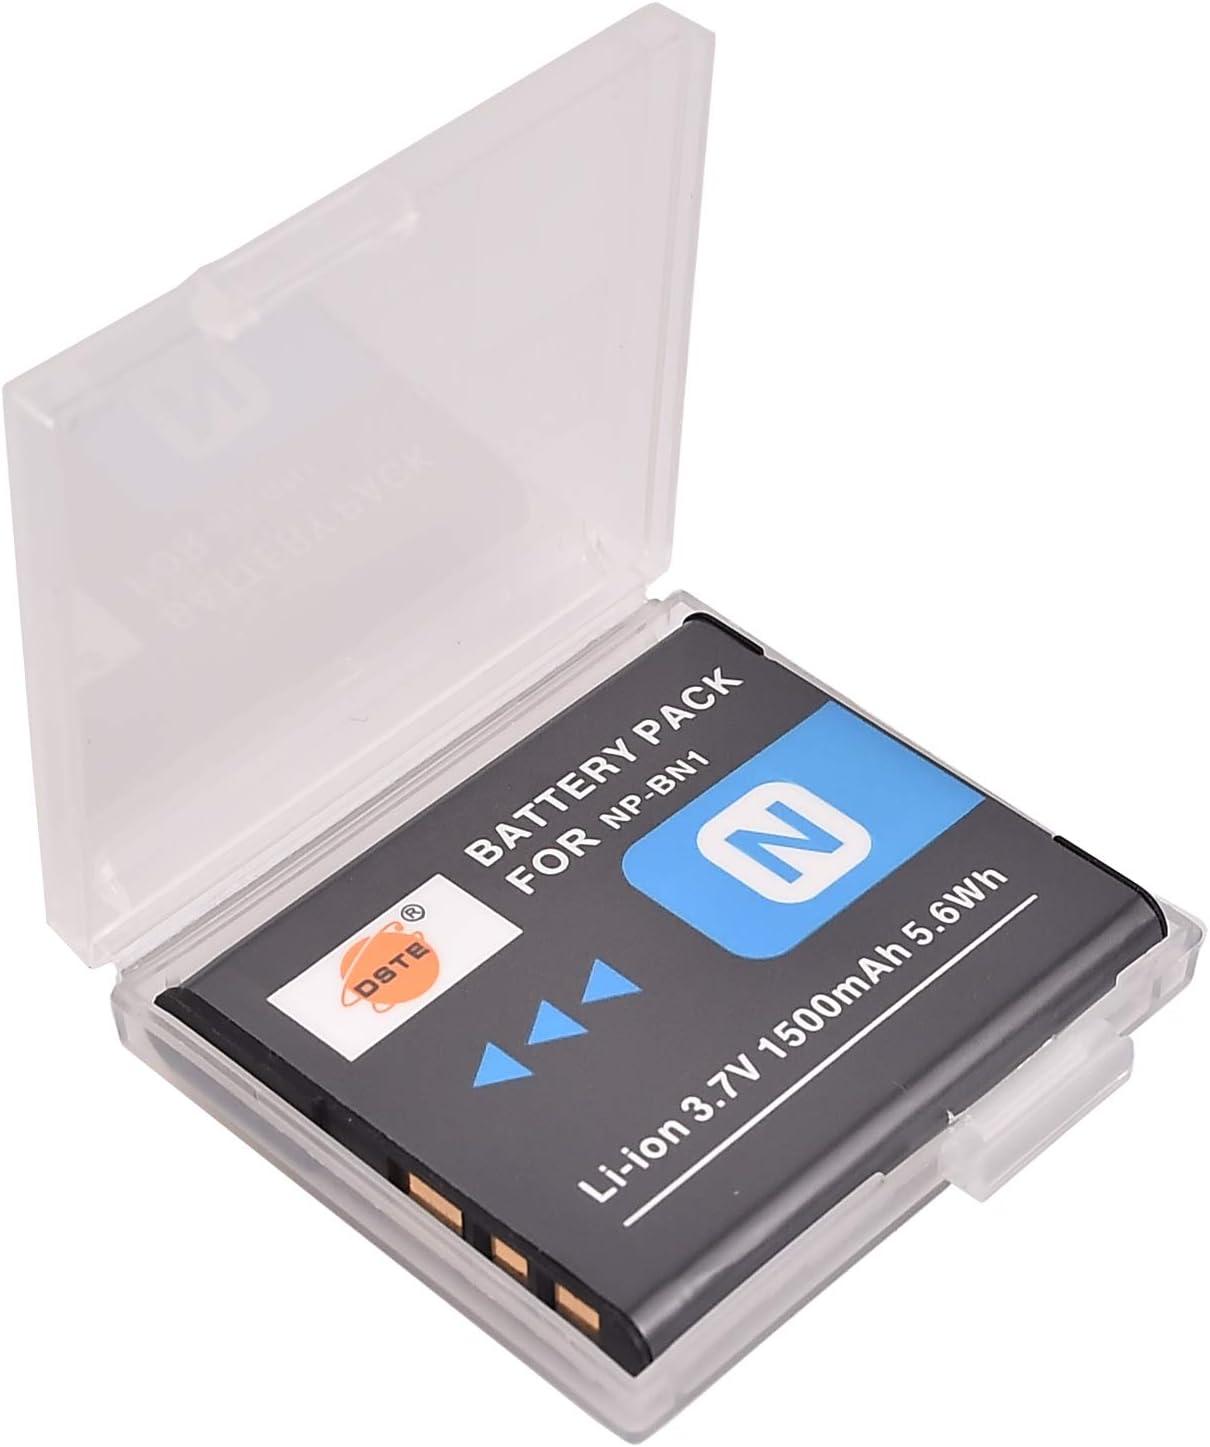 DSTE® 2x NP-BN1 Li-ion Batería para Sony Cyber-shot DSC-W510, DSC-W515PS, DSC-W500, DSC-W520, DSC-W530, DSC-W550, DSC-W560, DSC-W570, DSC-W580, DSC-W610, DSC-W620, DSC-W650, DSC-W690, DSC-W710, DSC-W730, DSC-W810, DSC-W830, DSC-WX5, DSC-WX7, DSC-WX9 ...